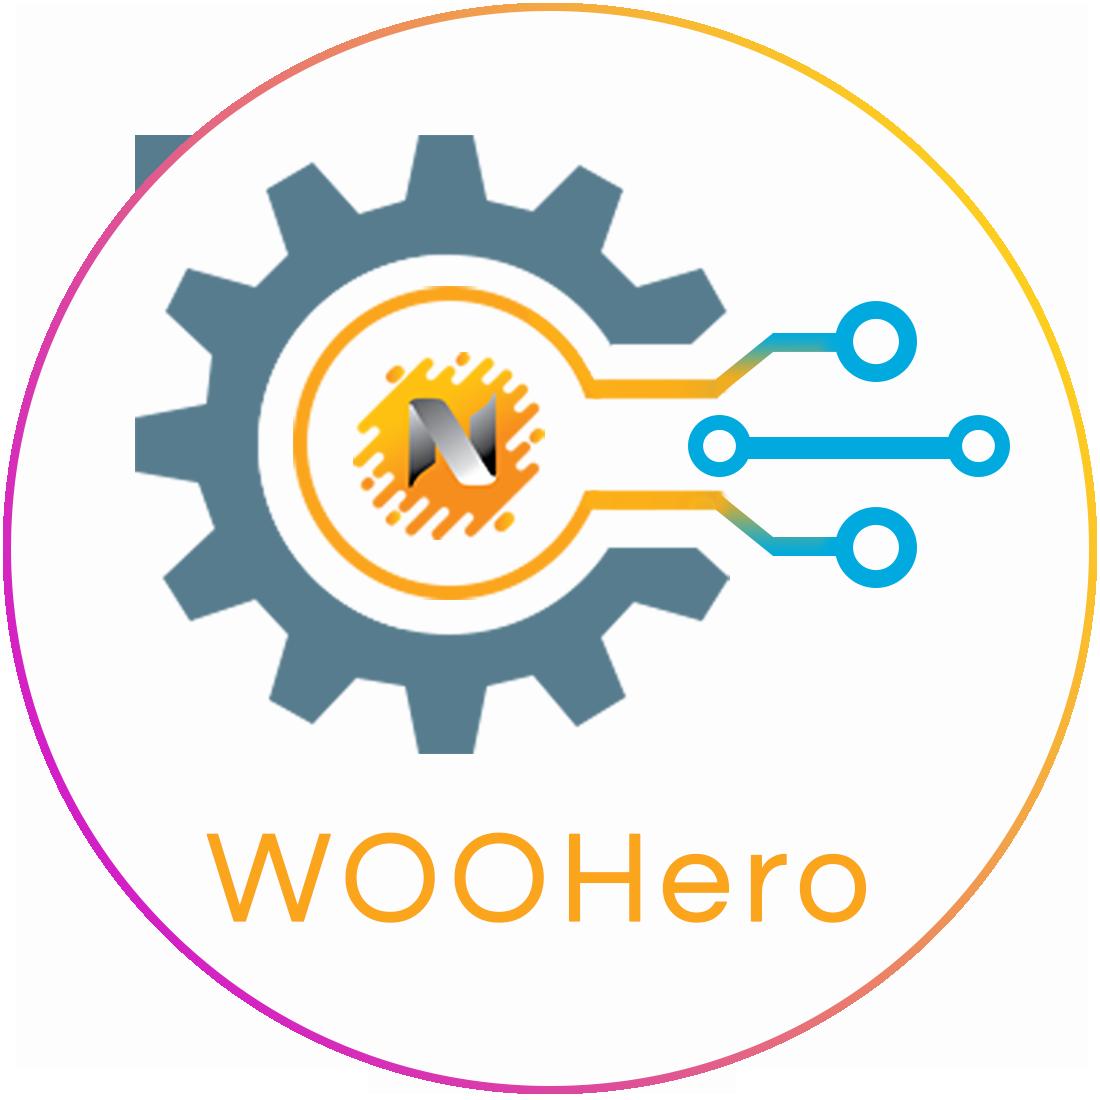 WOOHero